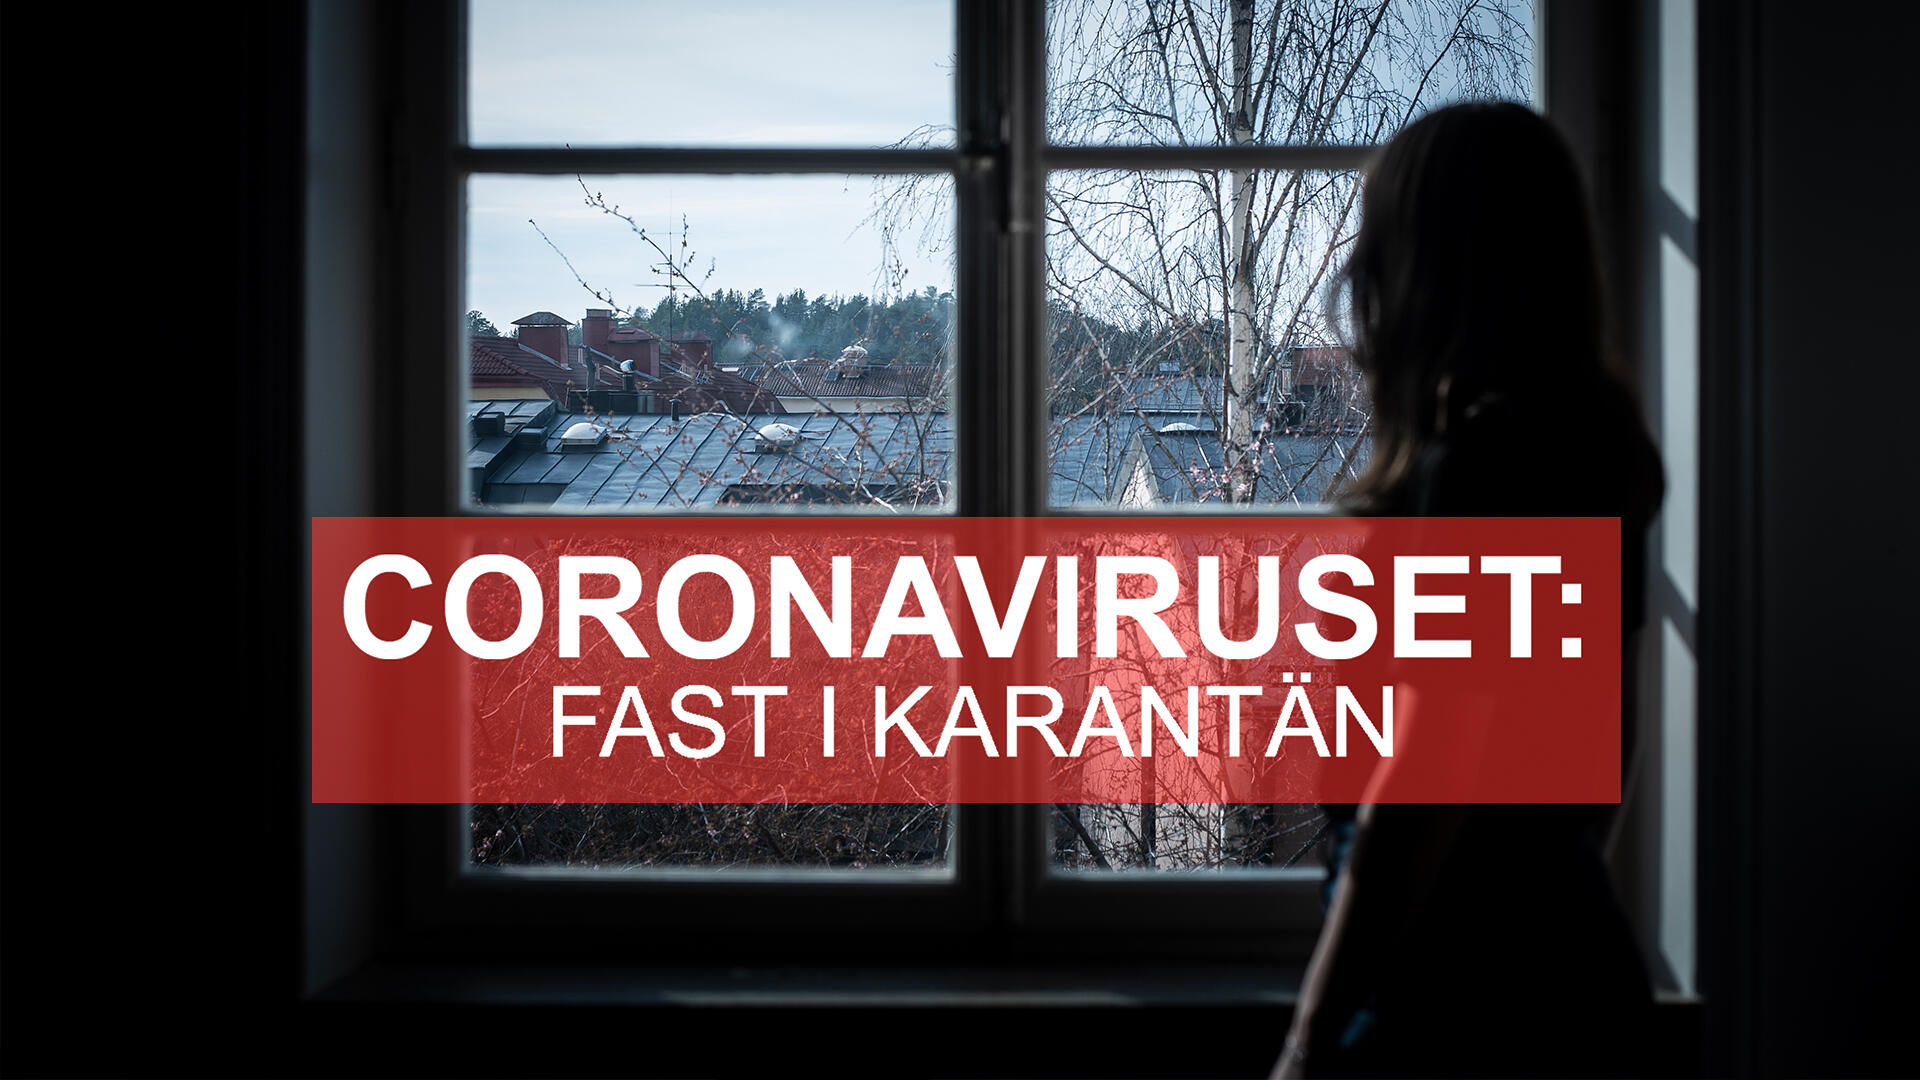 Coronaviruset - Fast i karantan.